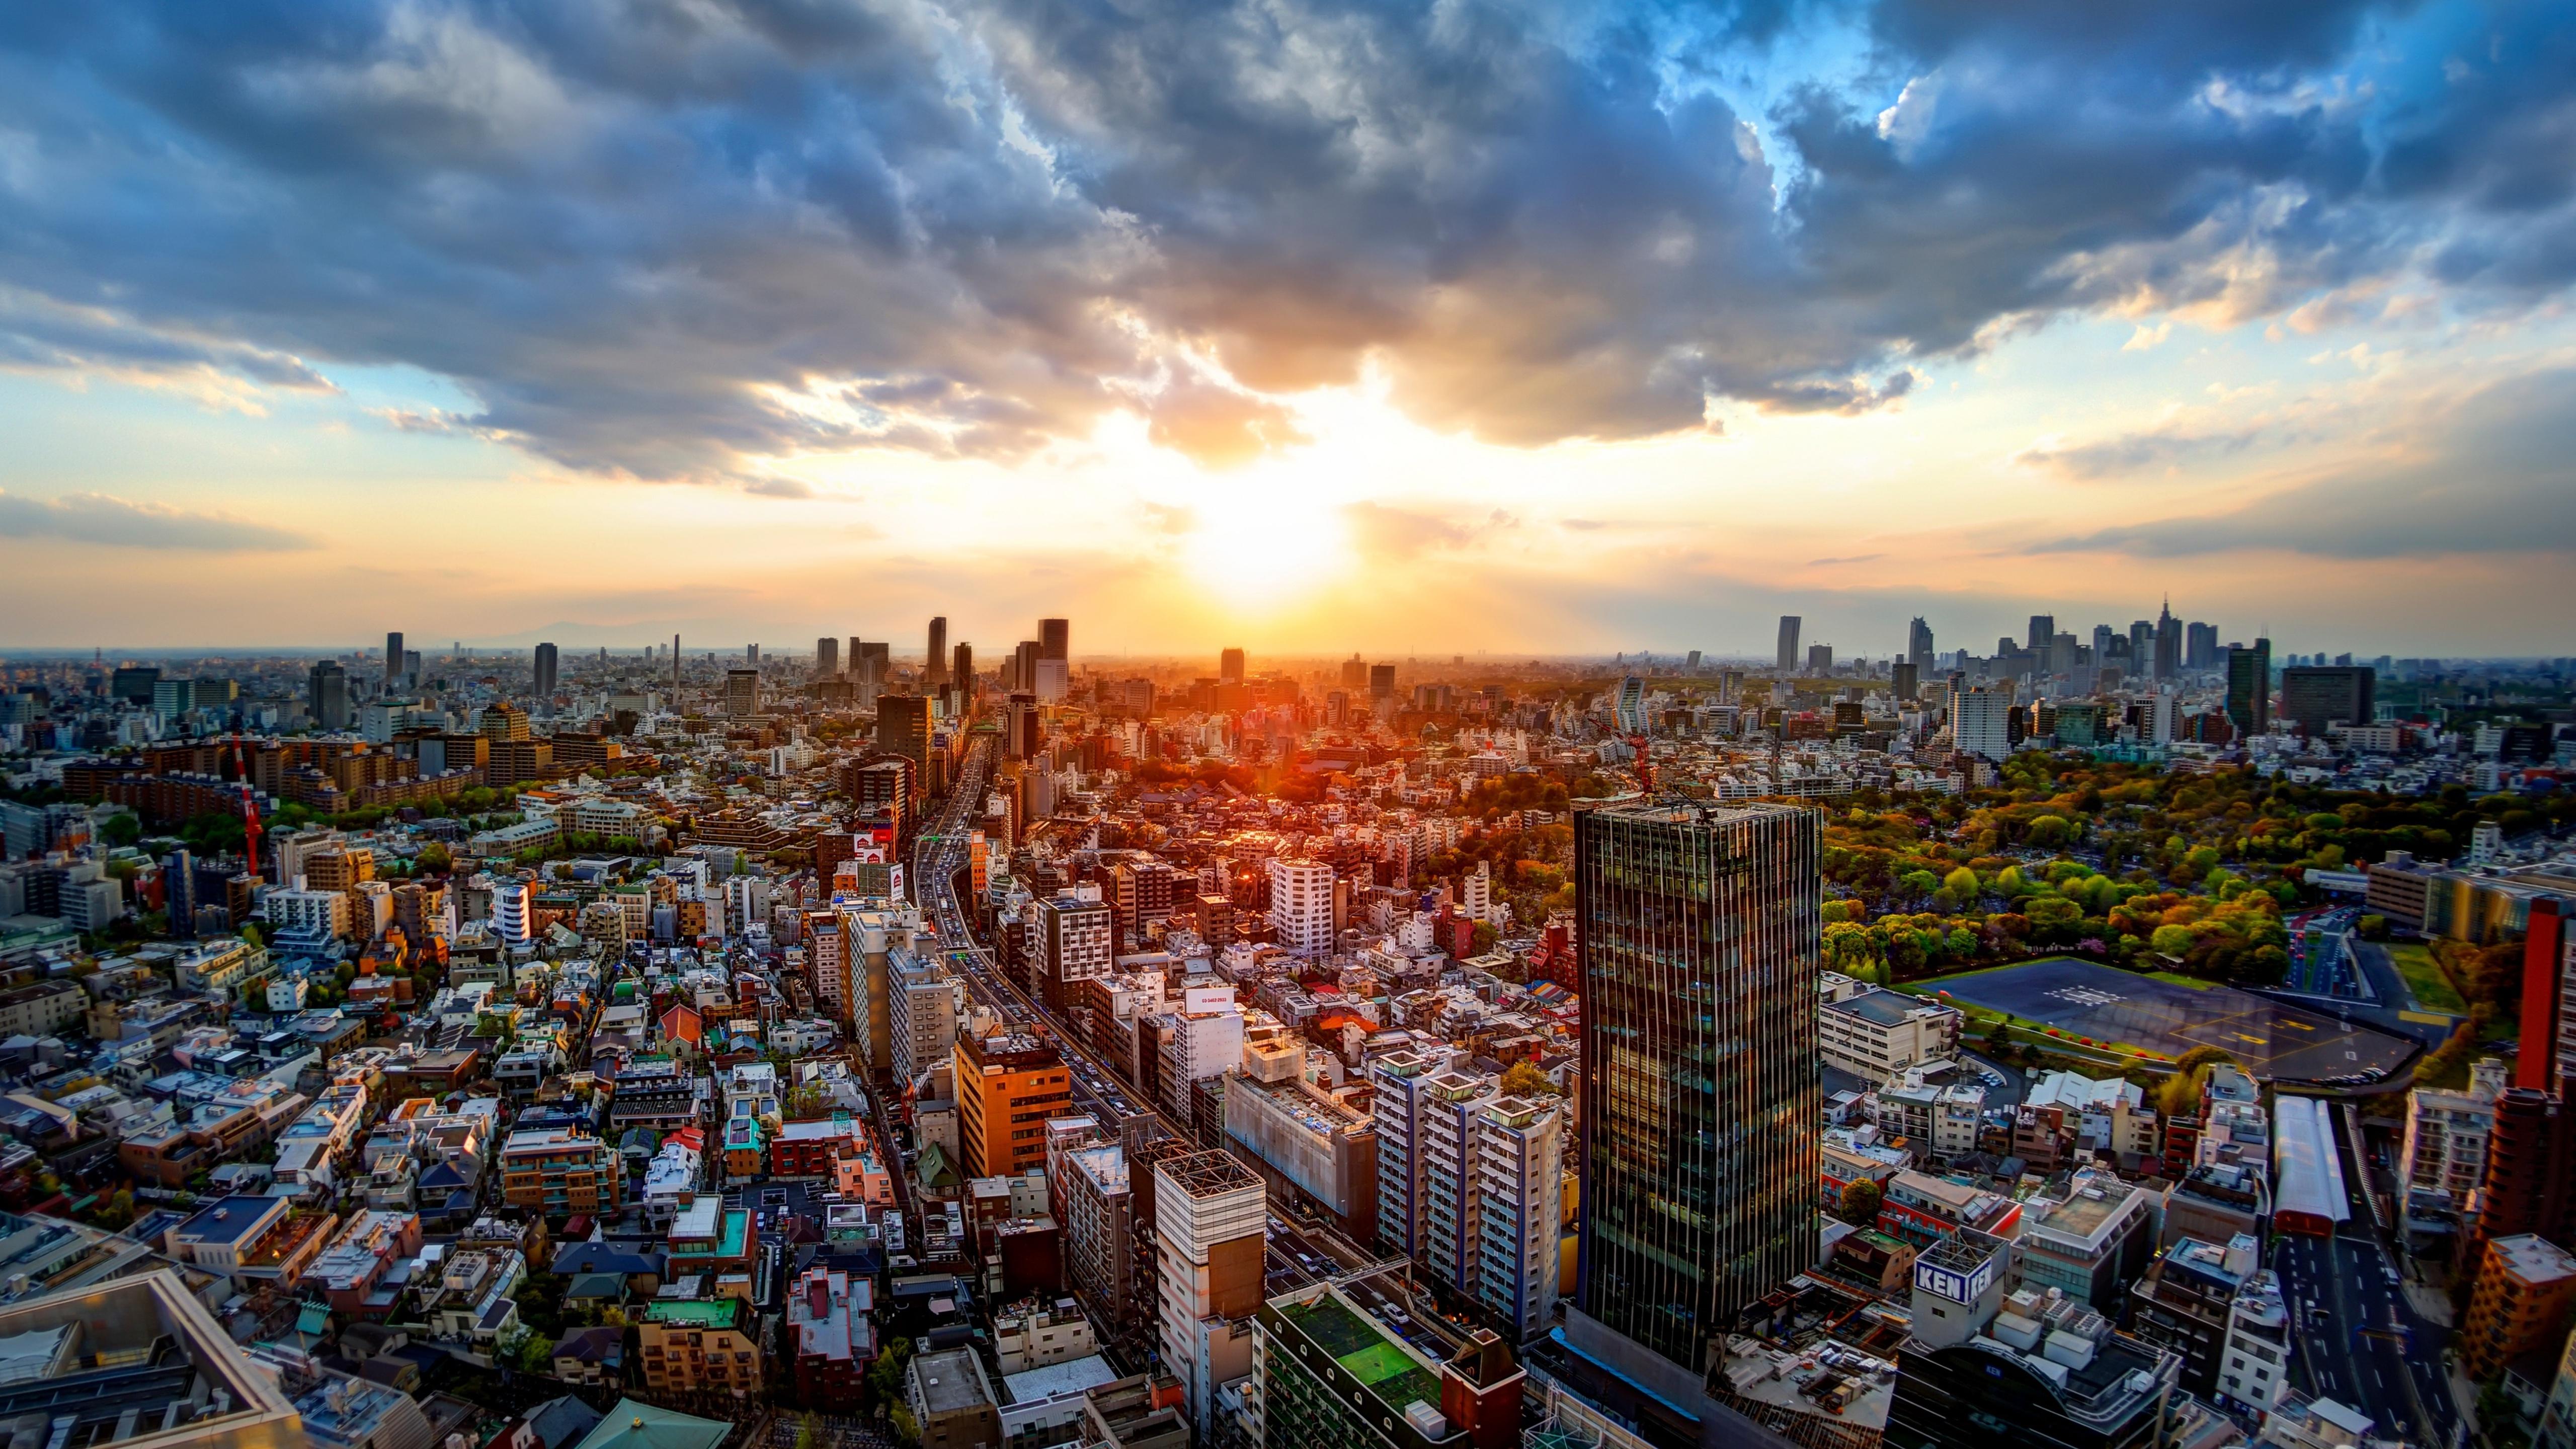 Tokyo 5k Retina Ultra Hd Wallpaper Background Image